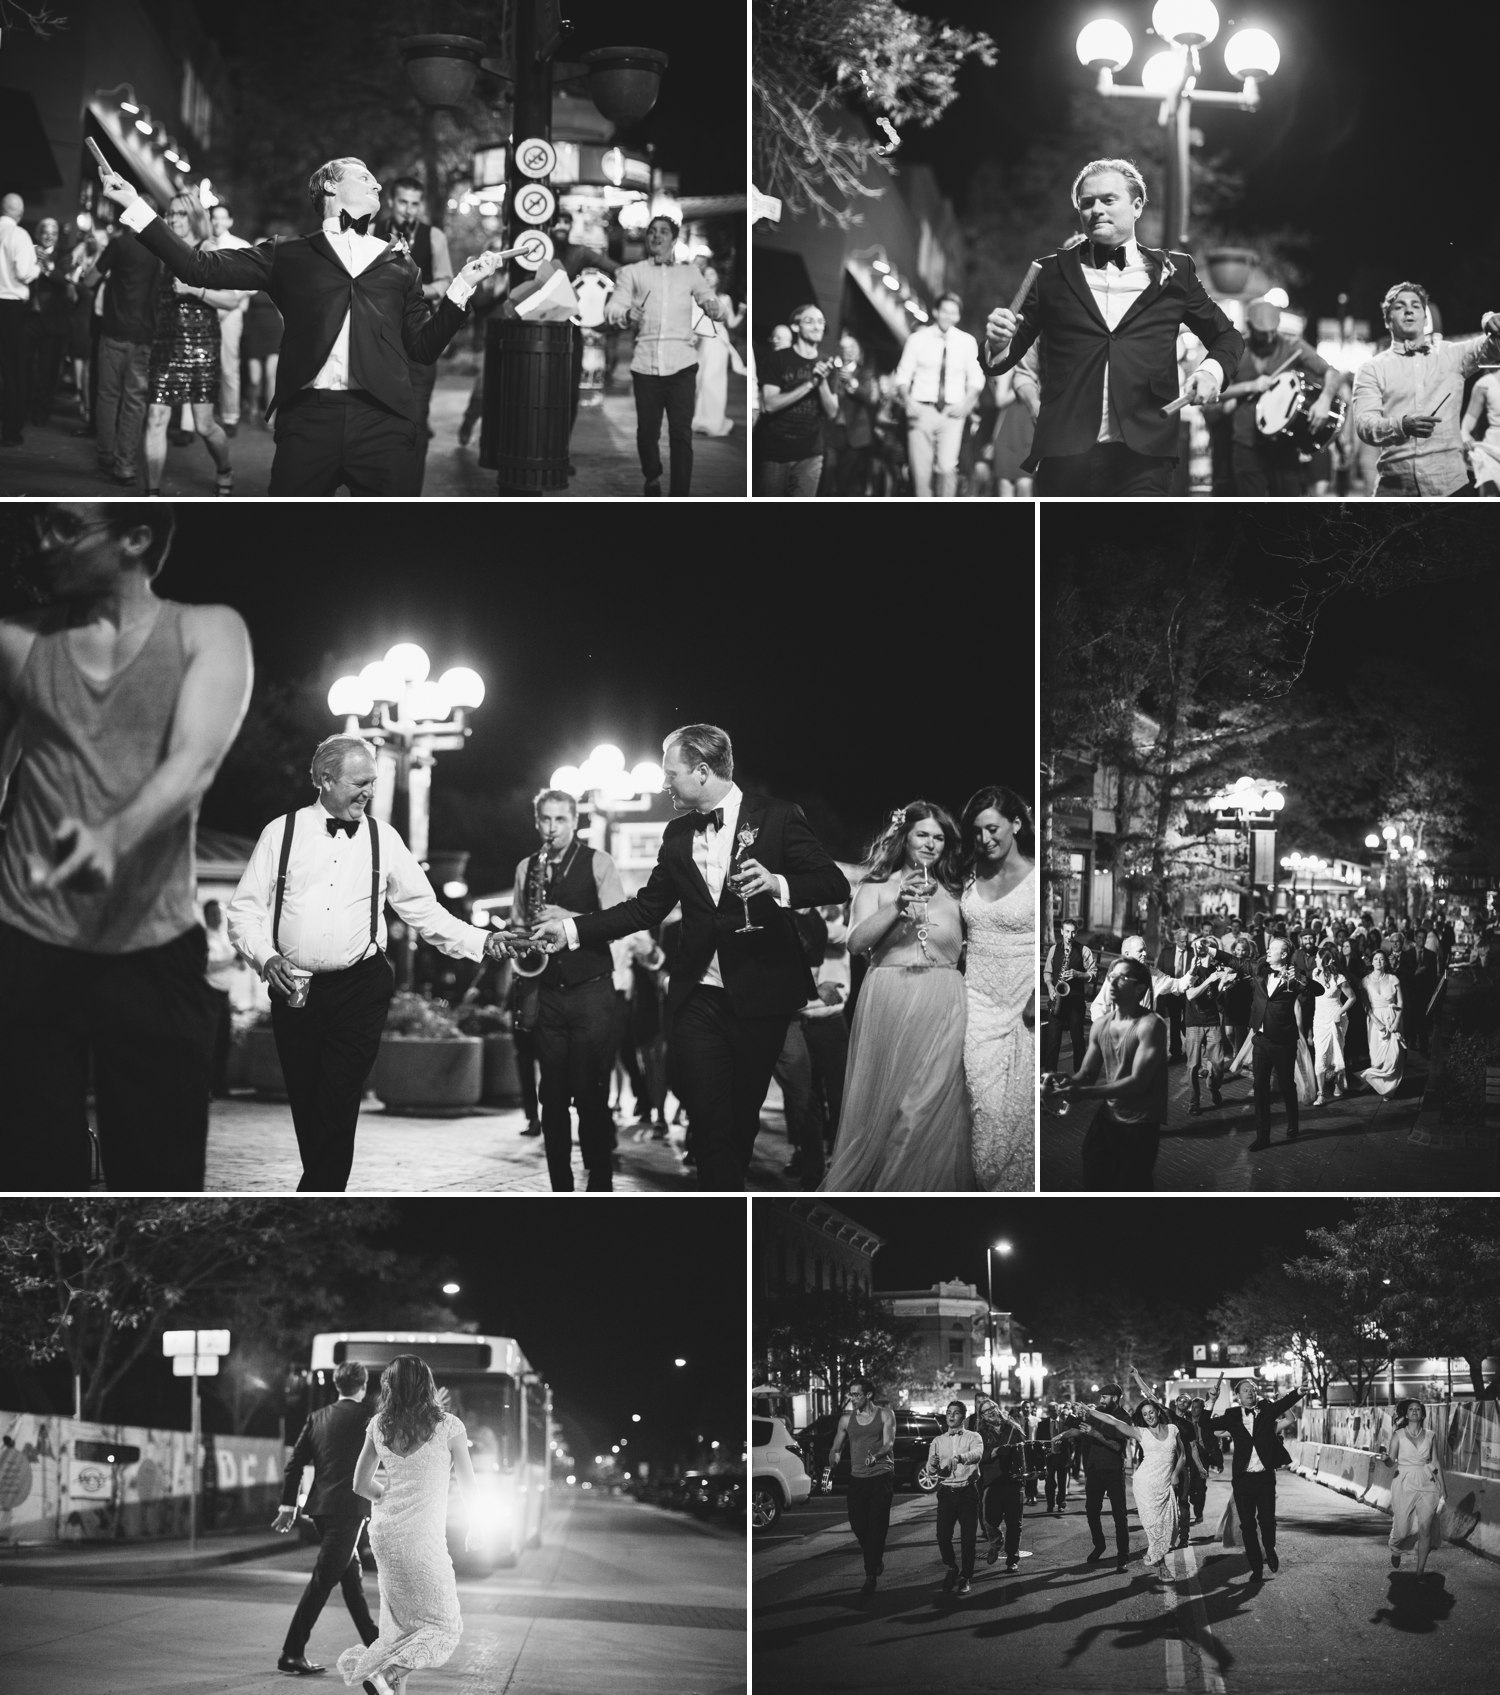 march down pearl street after wedding reception in boulder colorado